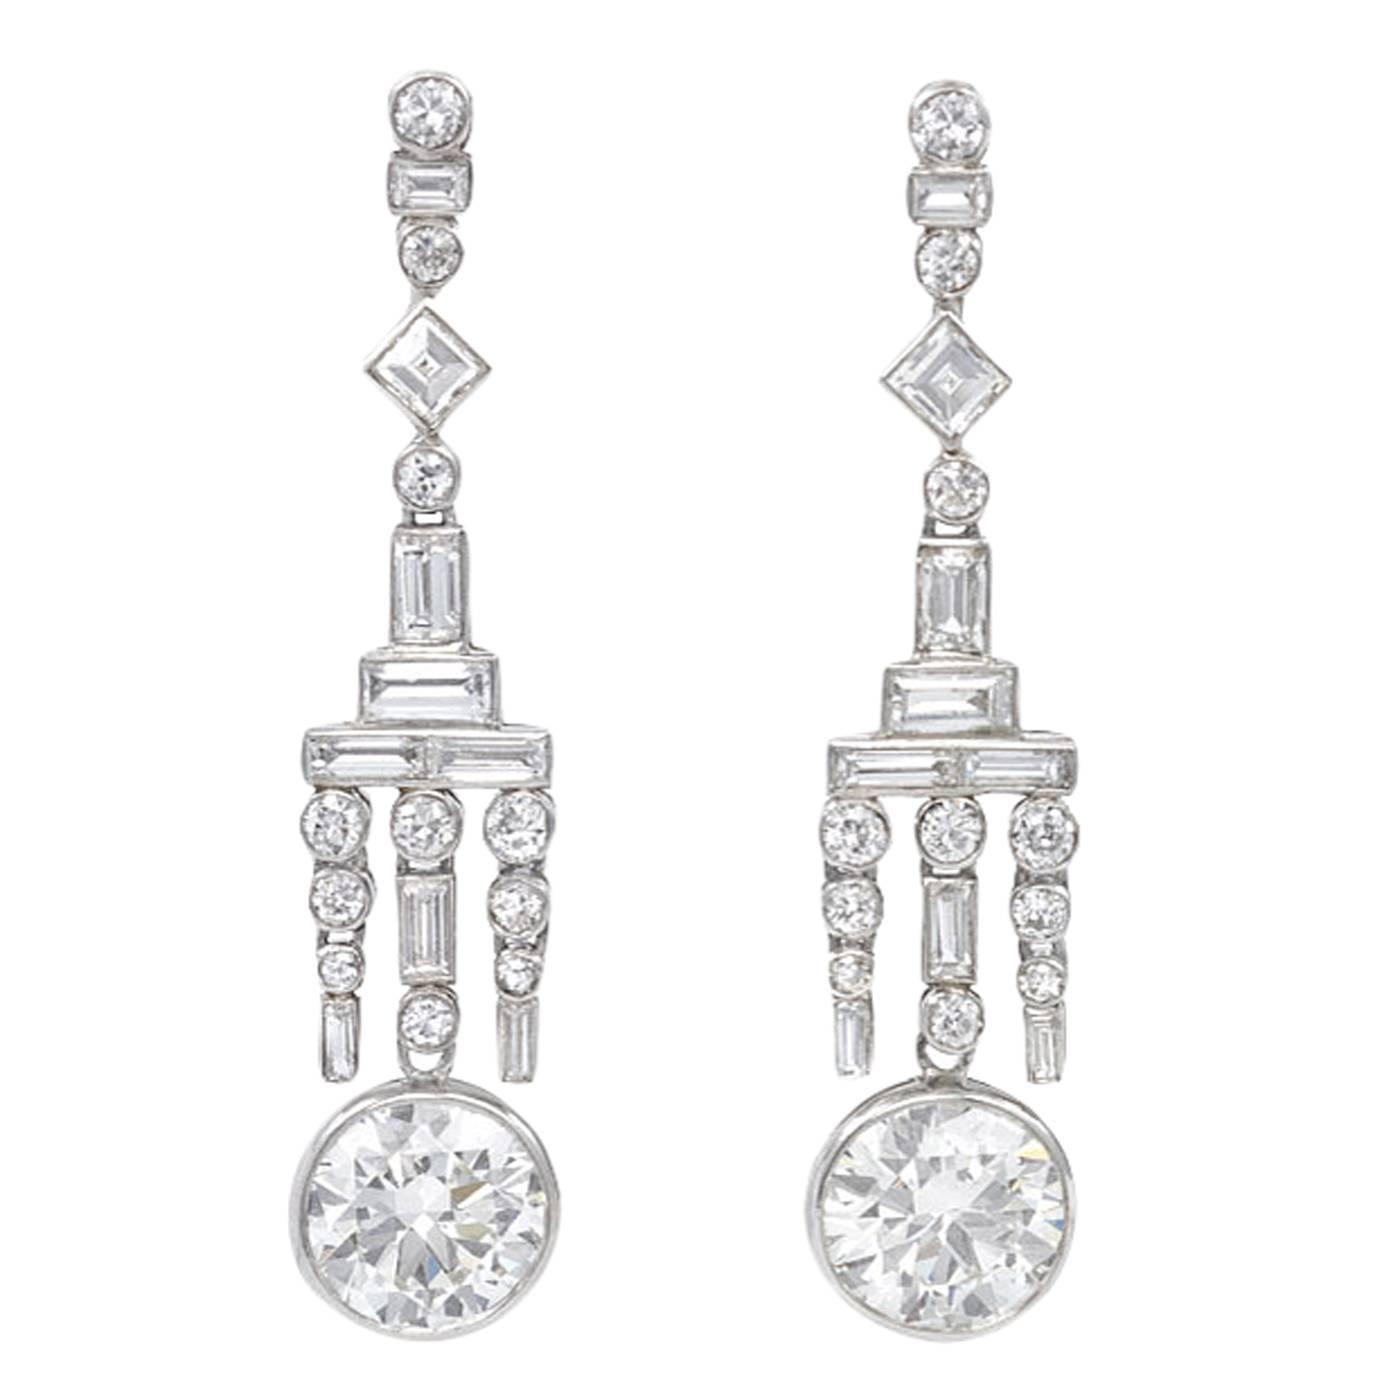 Art Deco Diamond Platinum Pendant Earrings For Sale at 1stdibs